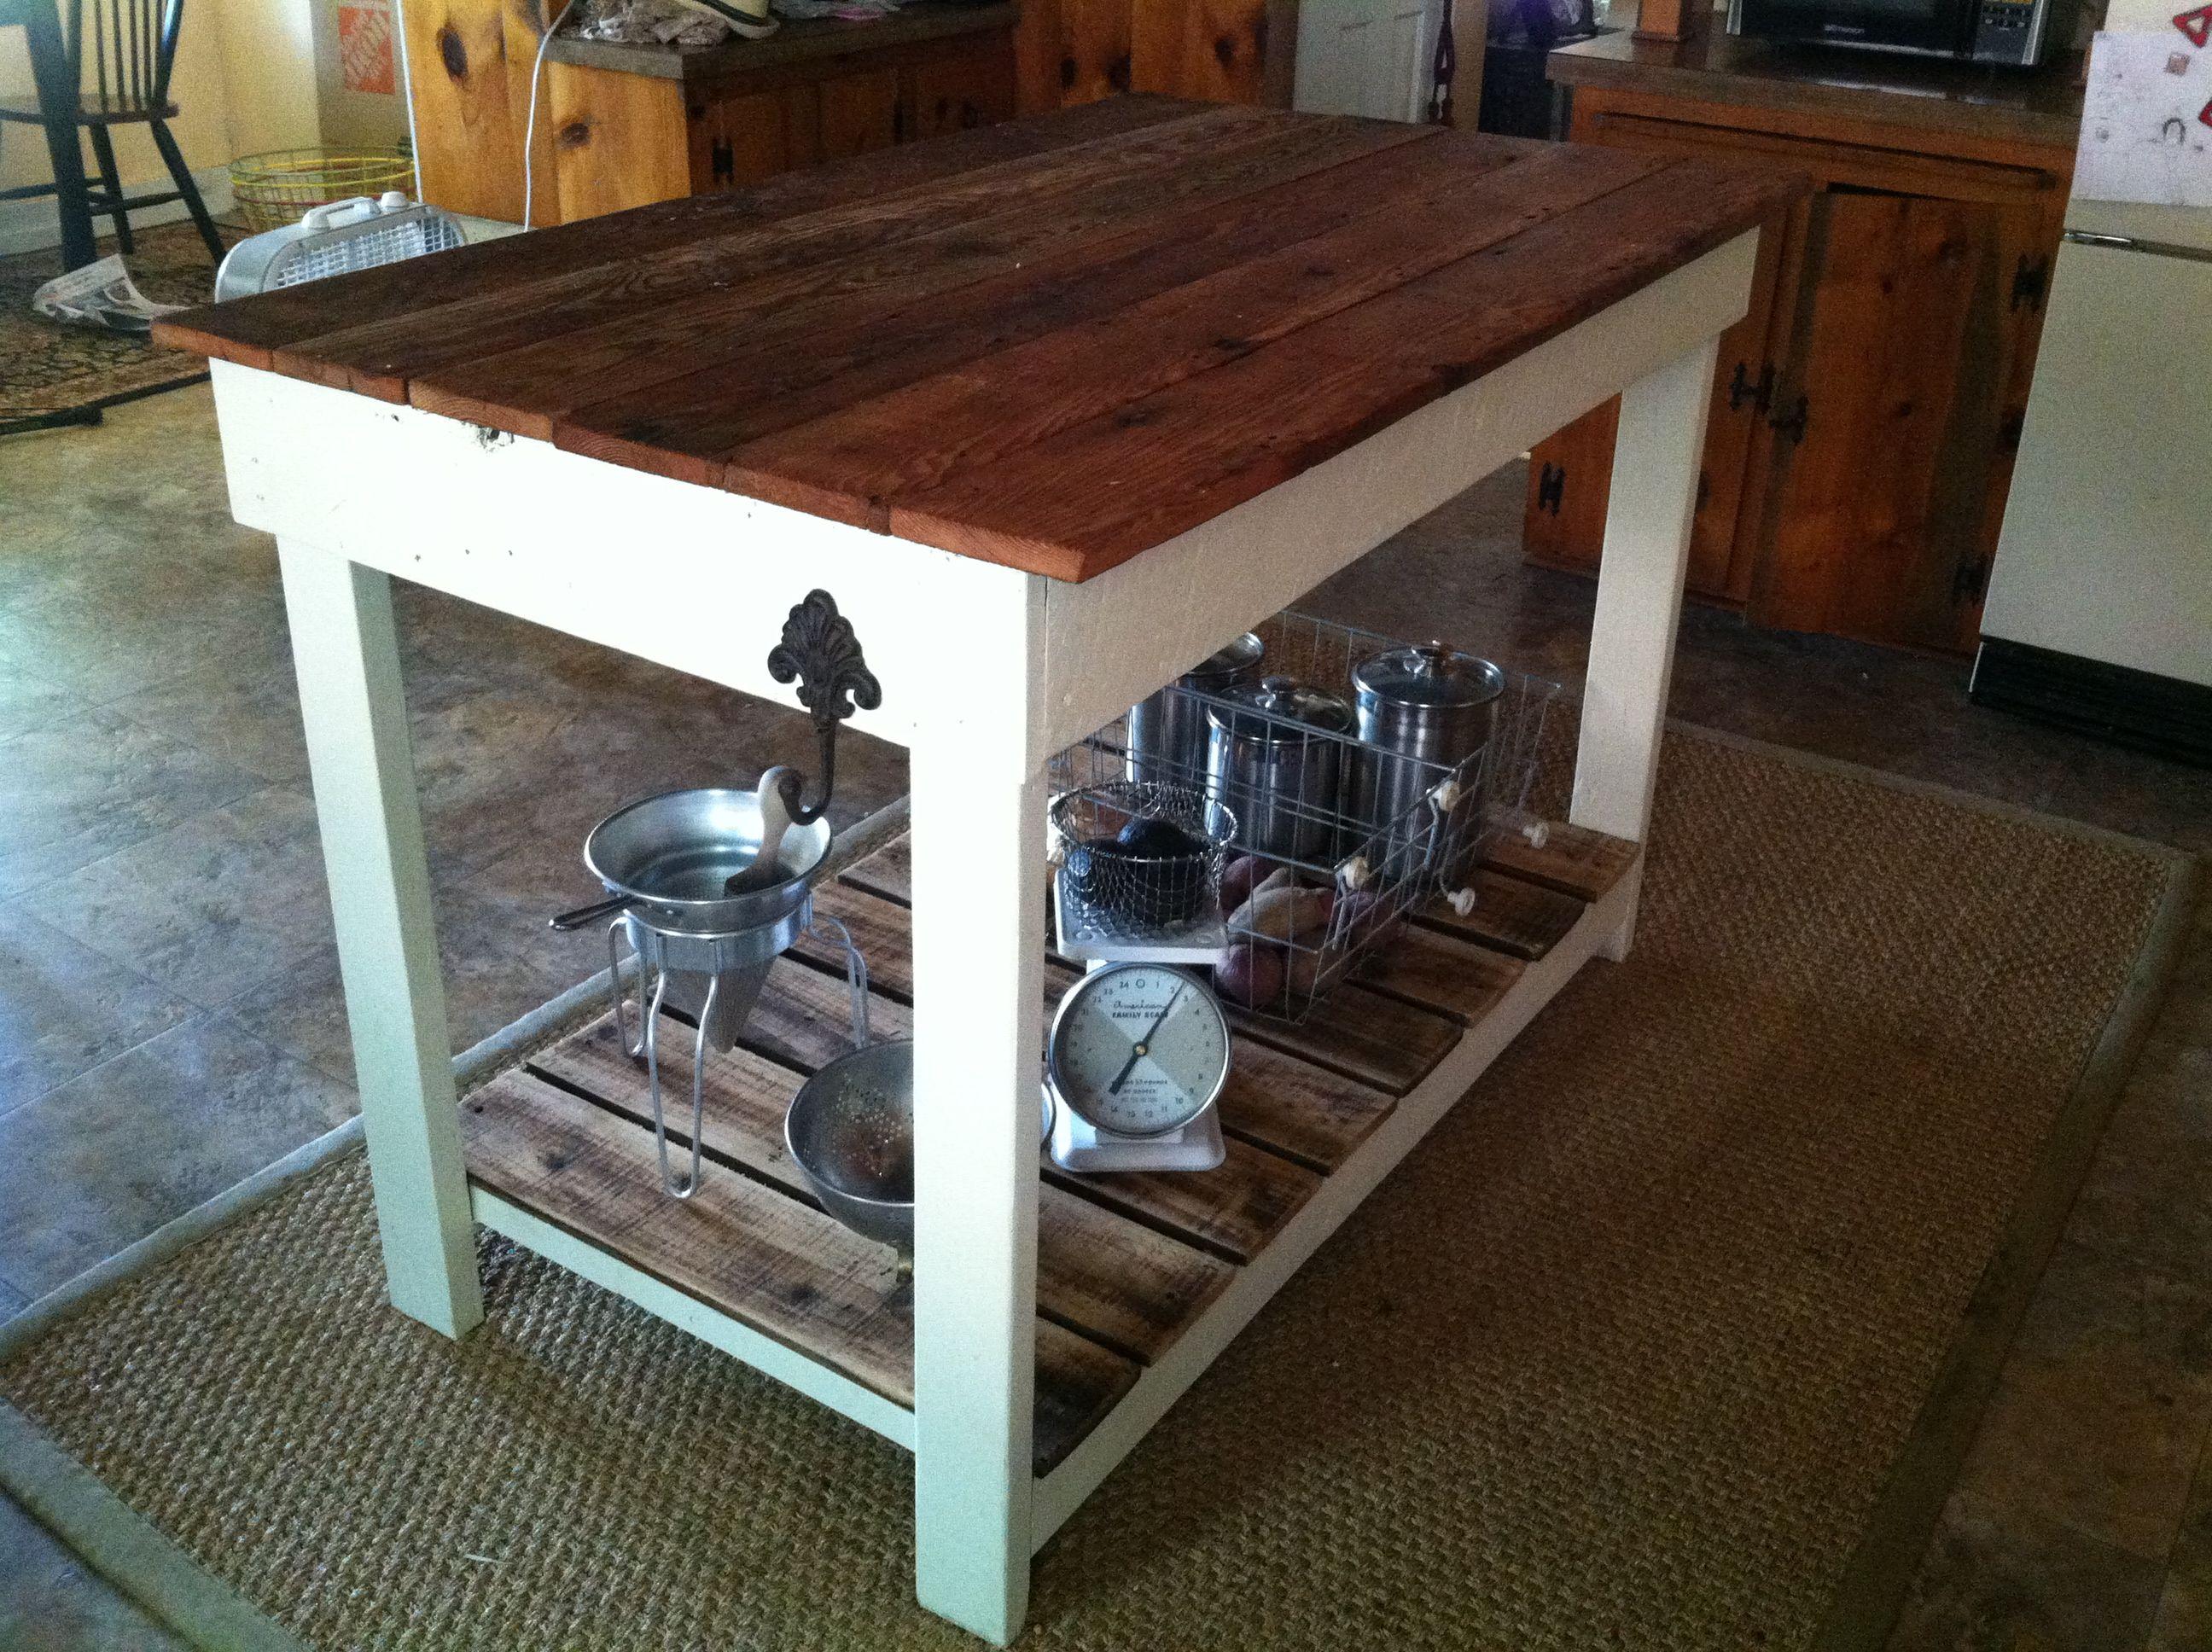 diy repurposed furniture. Kitchen Island Made From Scrap Wood DIY Diy Repurposed Furniture A